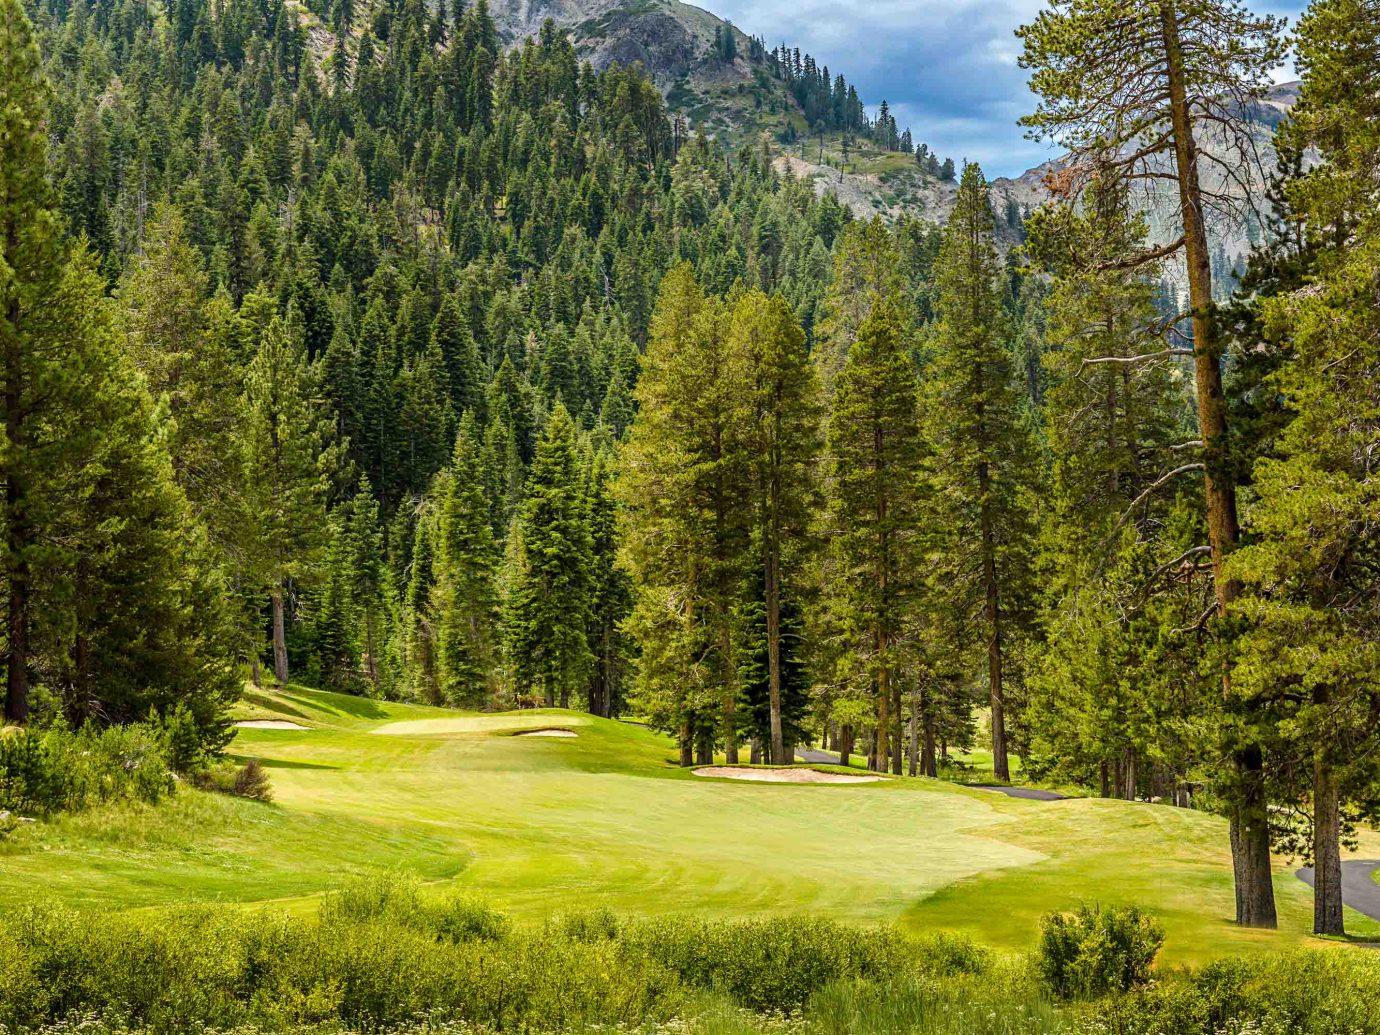 Lake Tahoe greenery